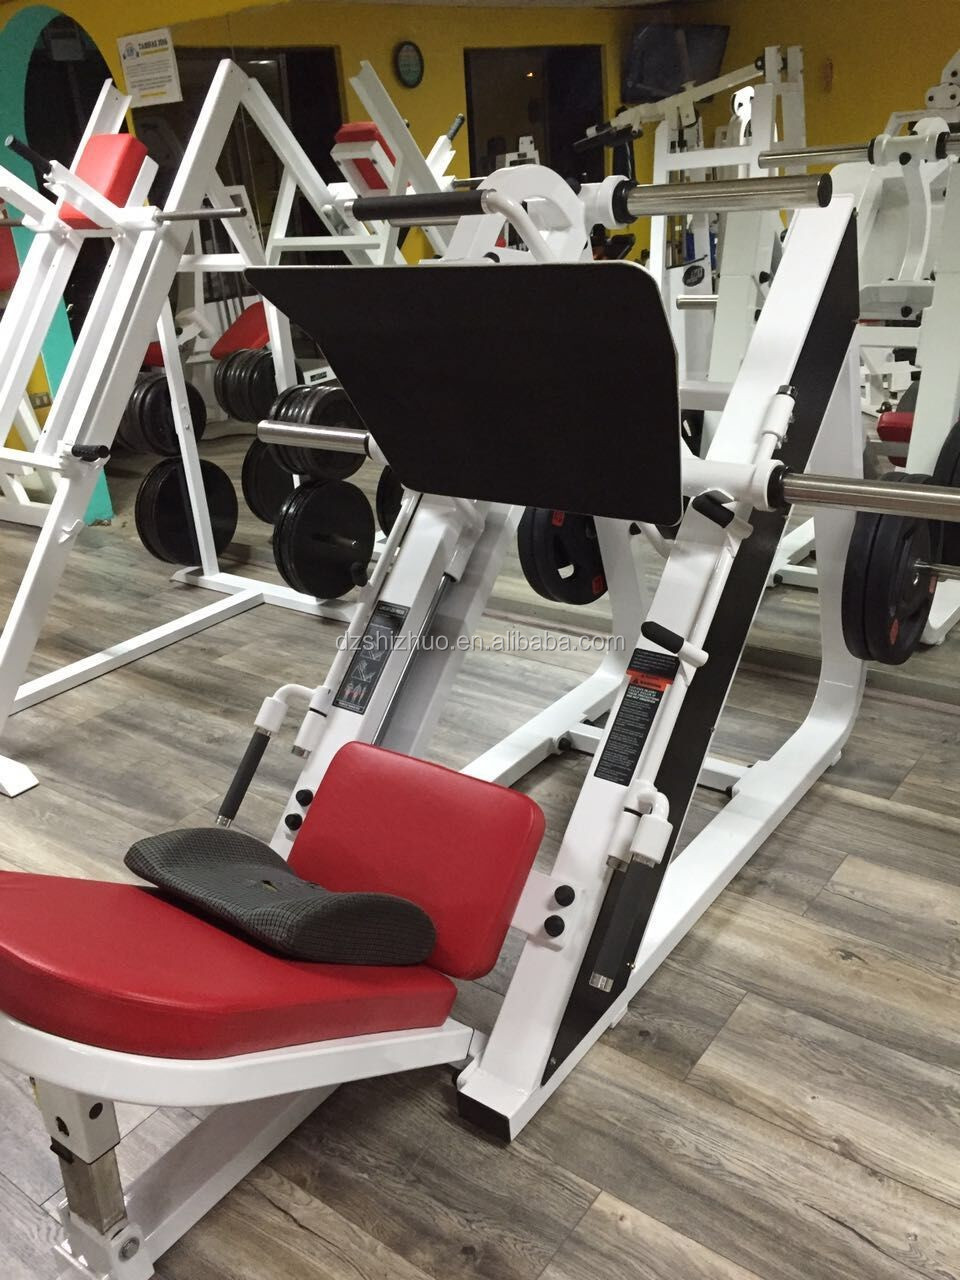 Hot Selling Gym Equipment Leg Press Sp42/body Building Gym ...